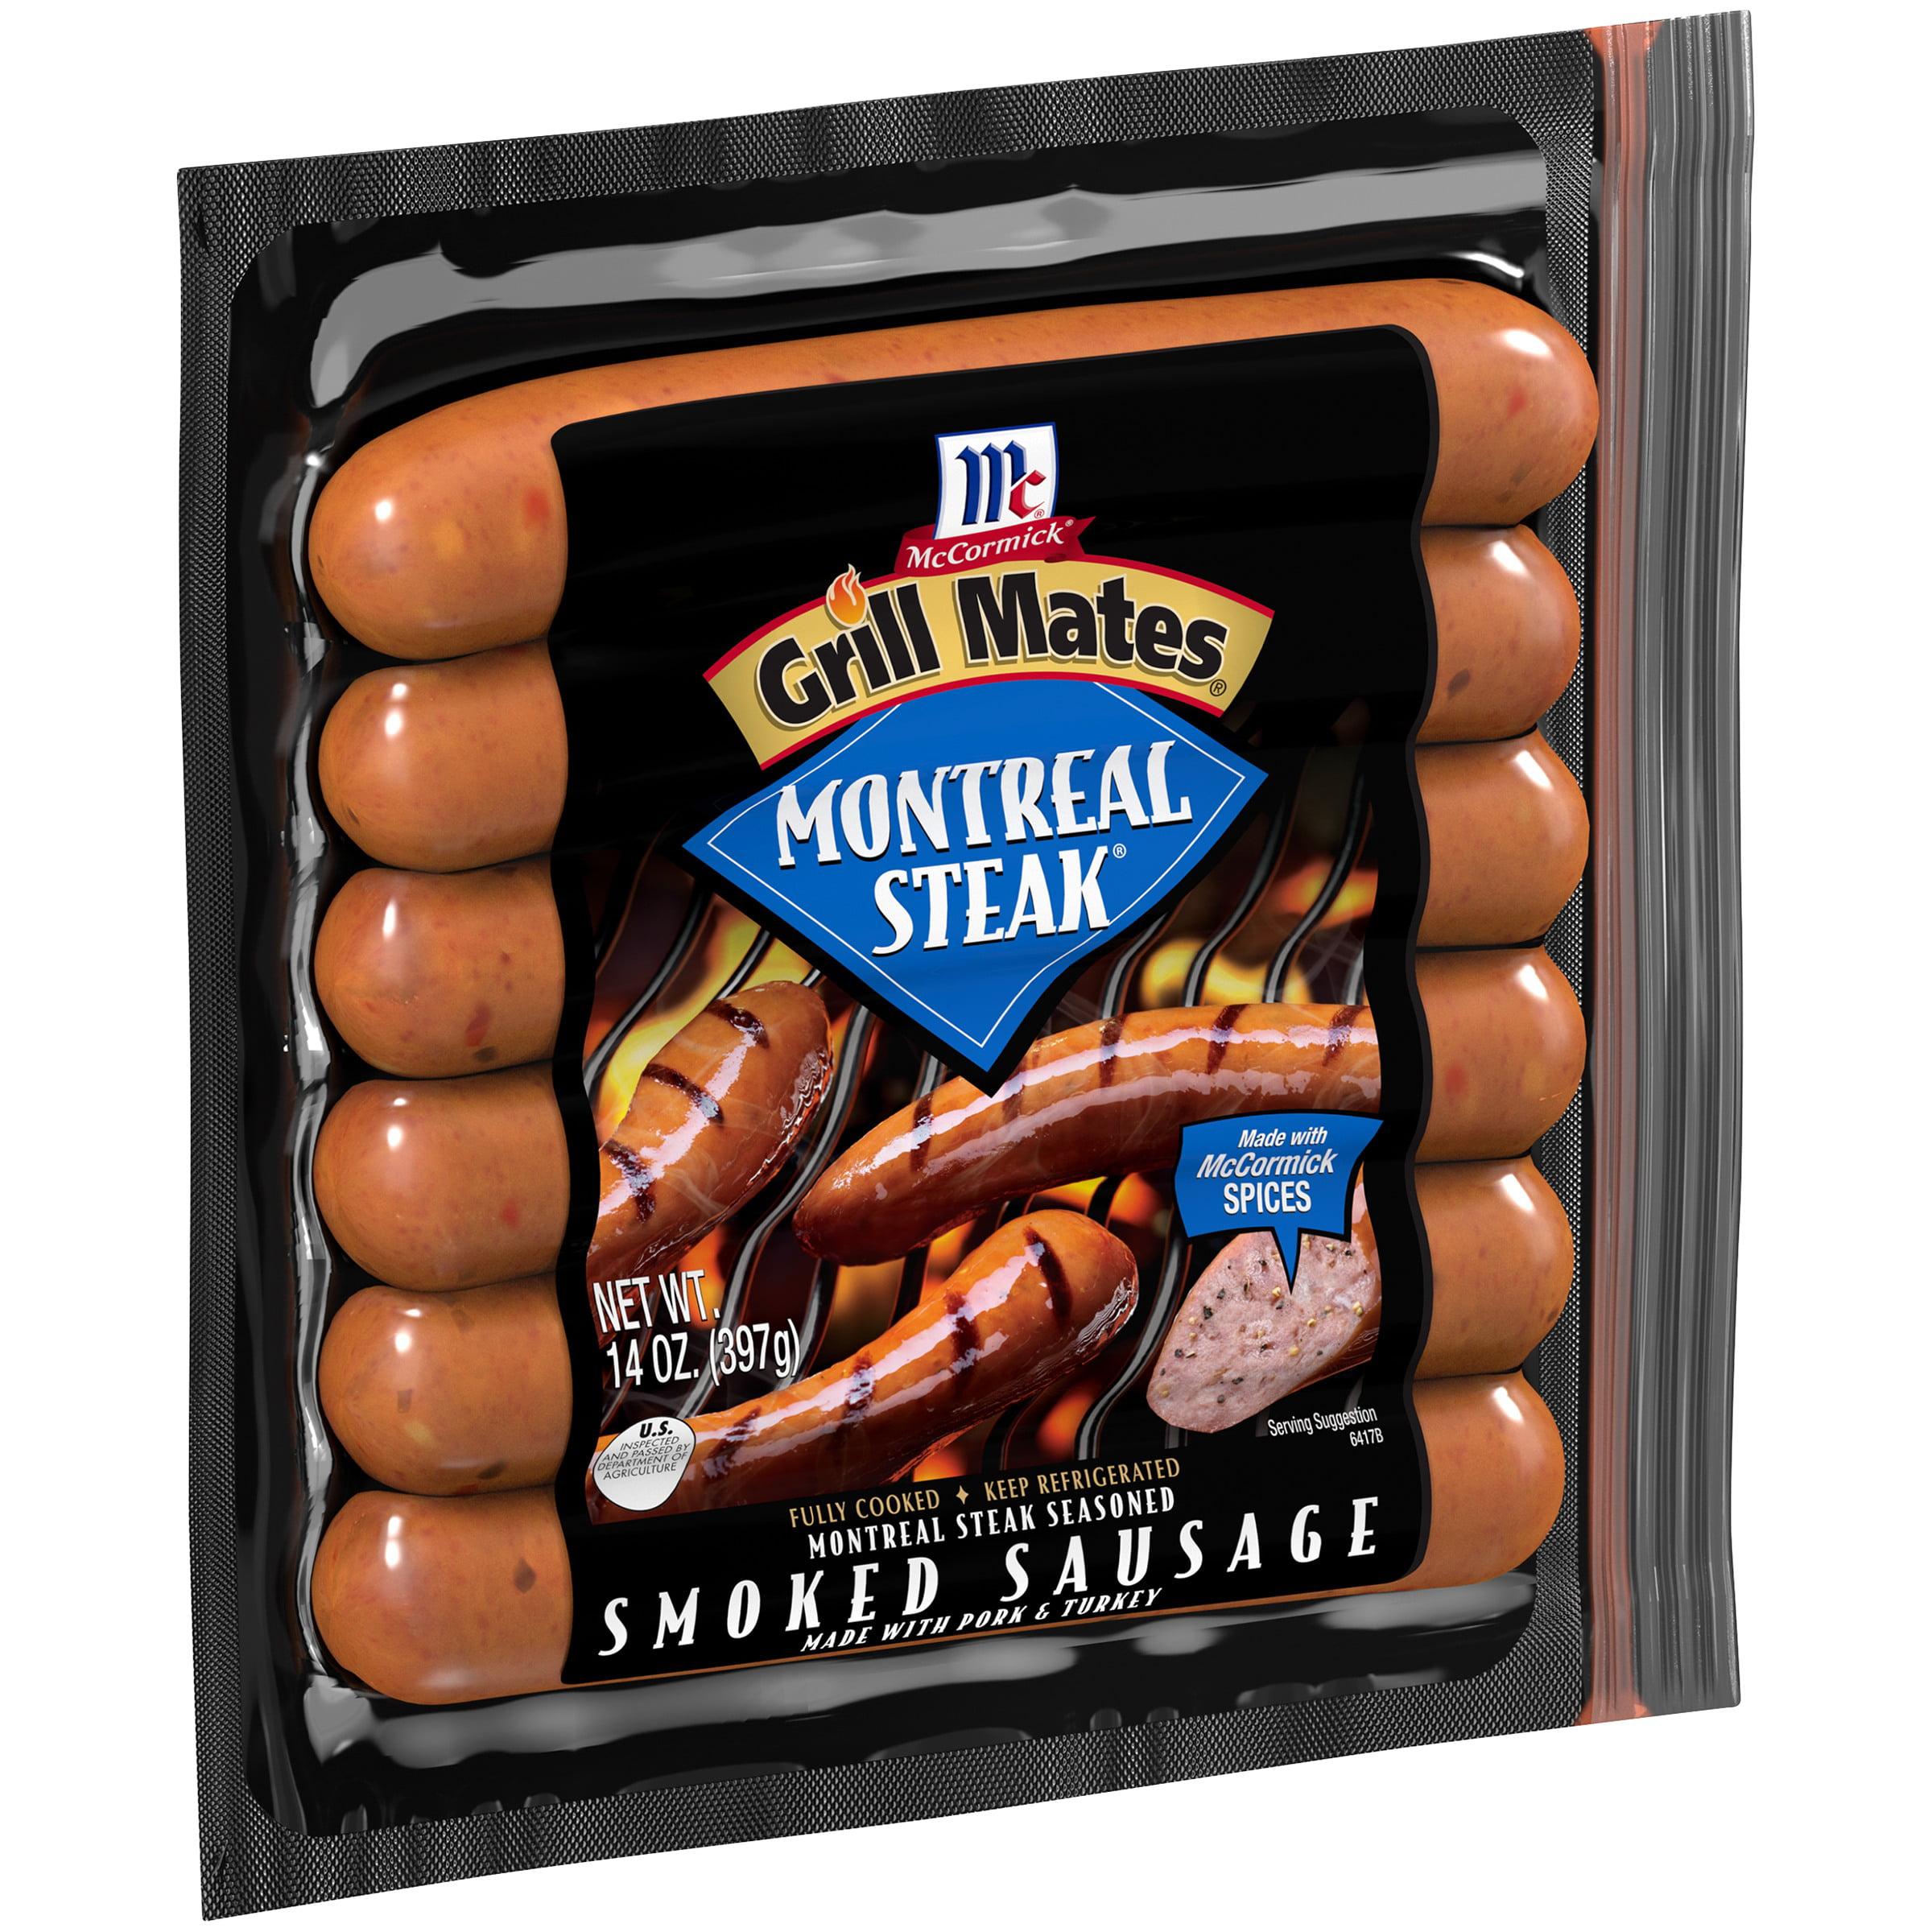 McCormick Grill Mates Montreal Steak Seasoned Smoked Sausage, 14 oz